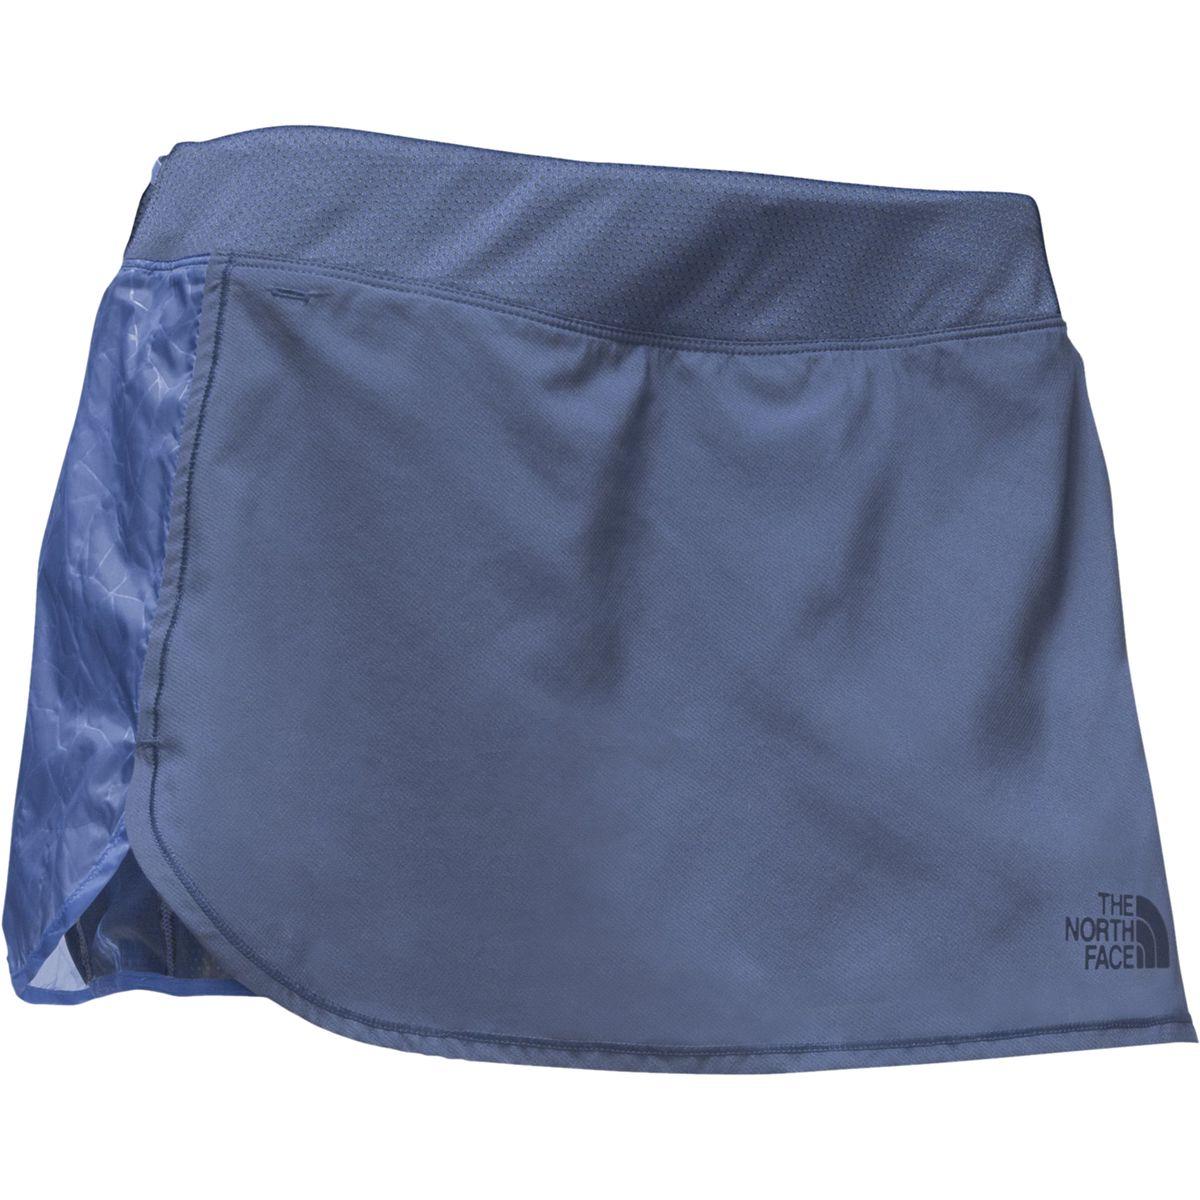 The North Face Better Than Naked Long Haul Skirt - Women